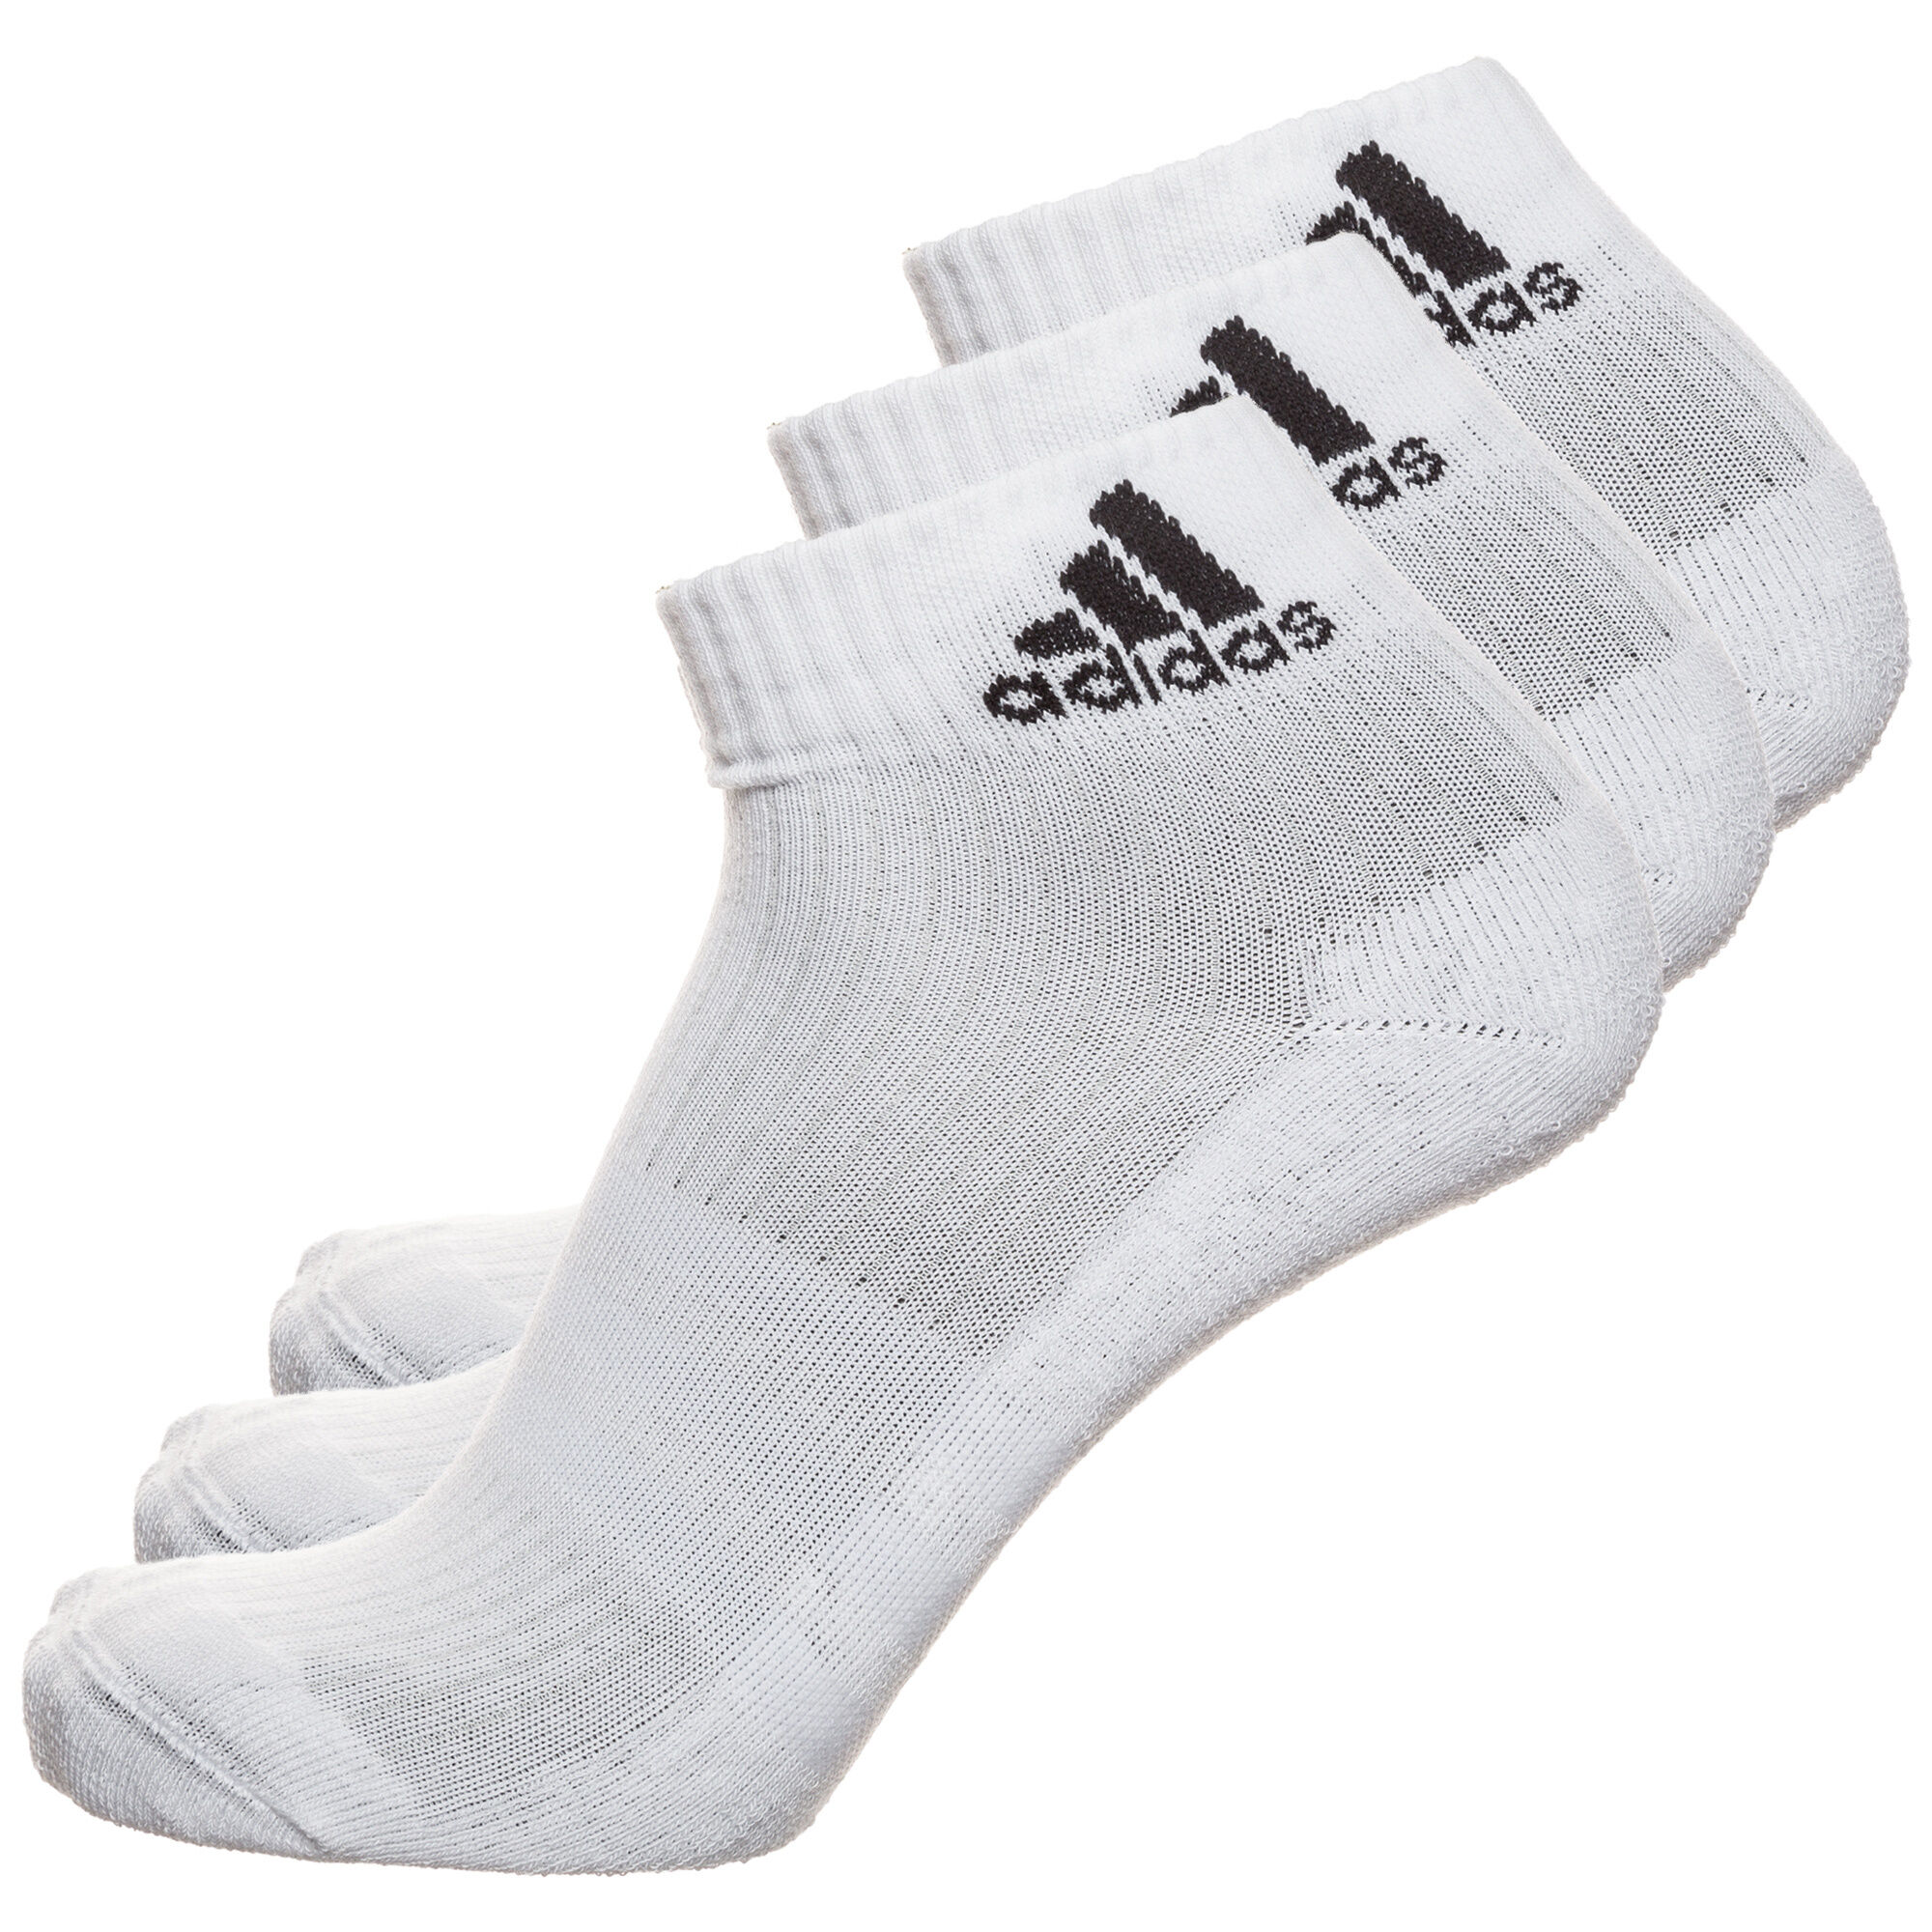 adidas Performance 3 Stripes Performance Ankle Socken 3er